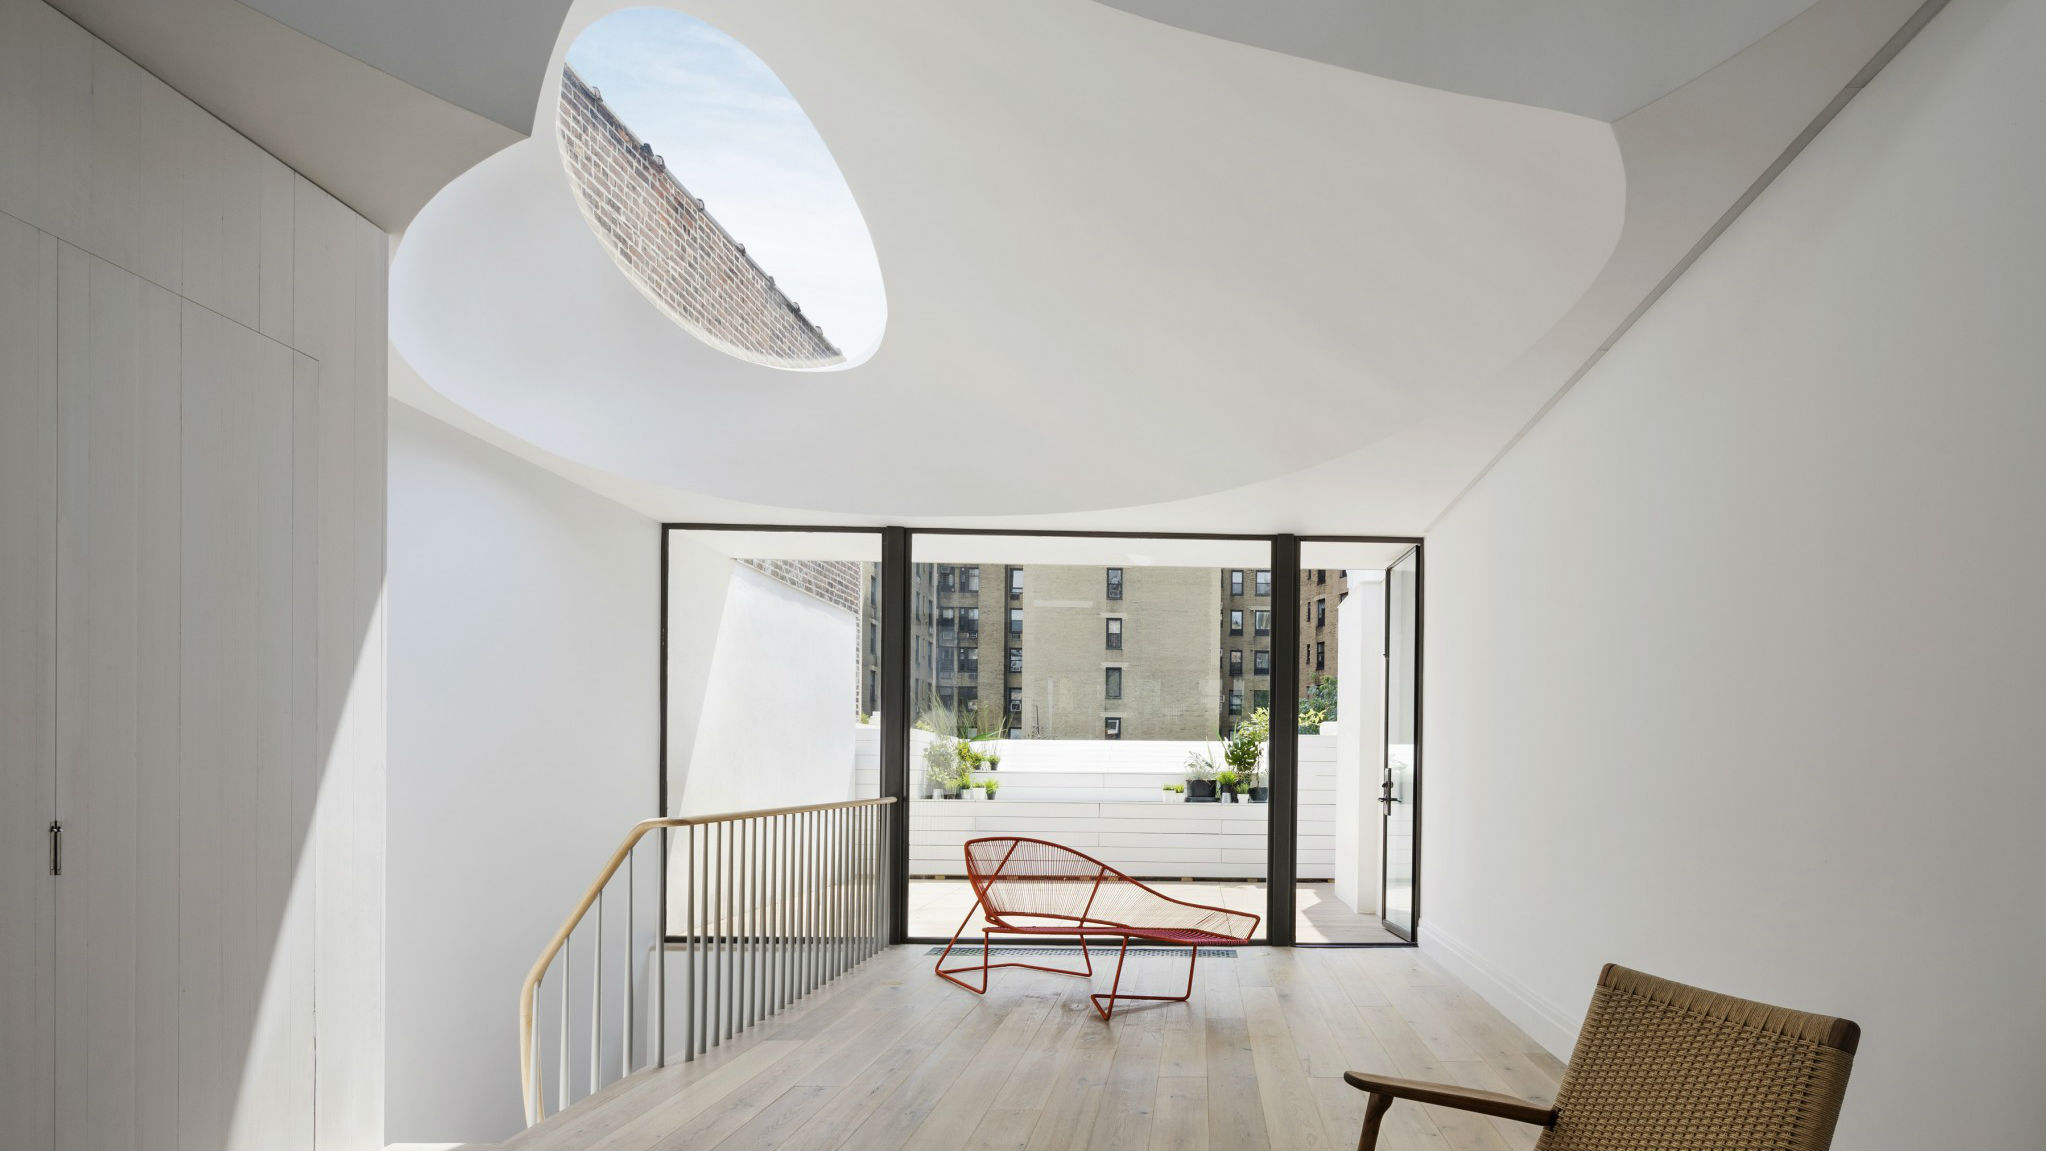 Oculi House, USA, by O'Neill Rose Architects